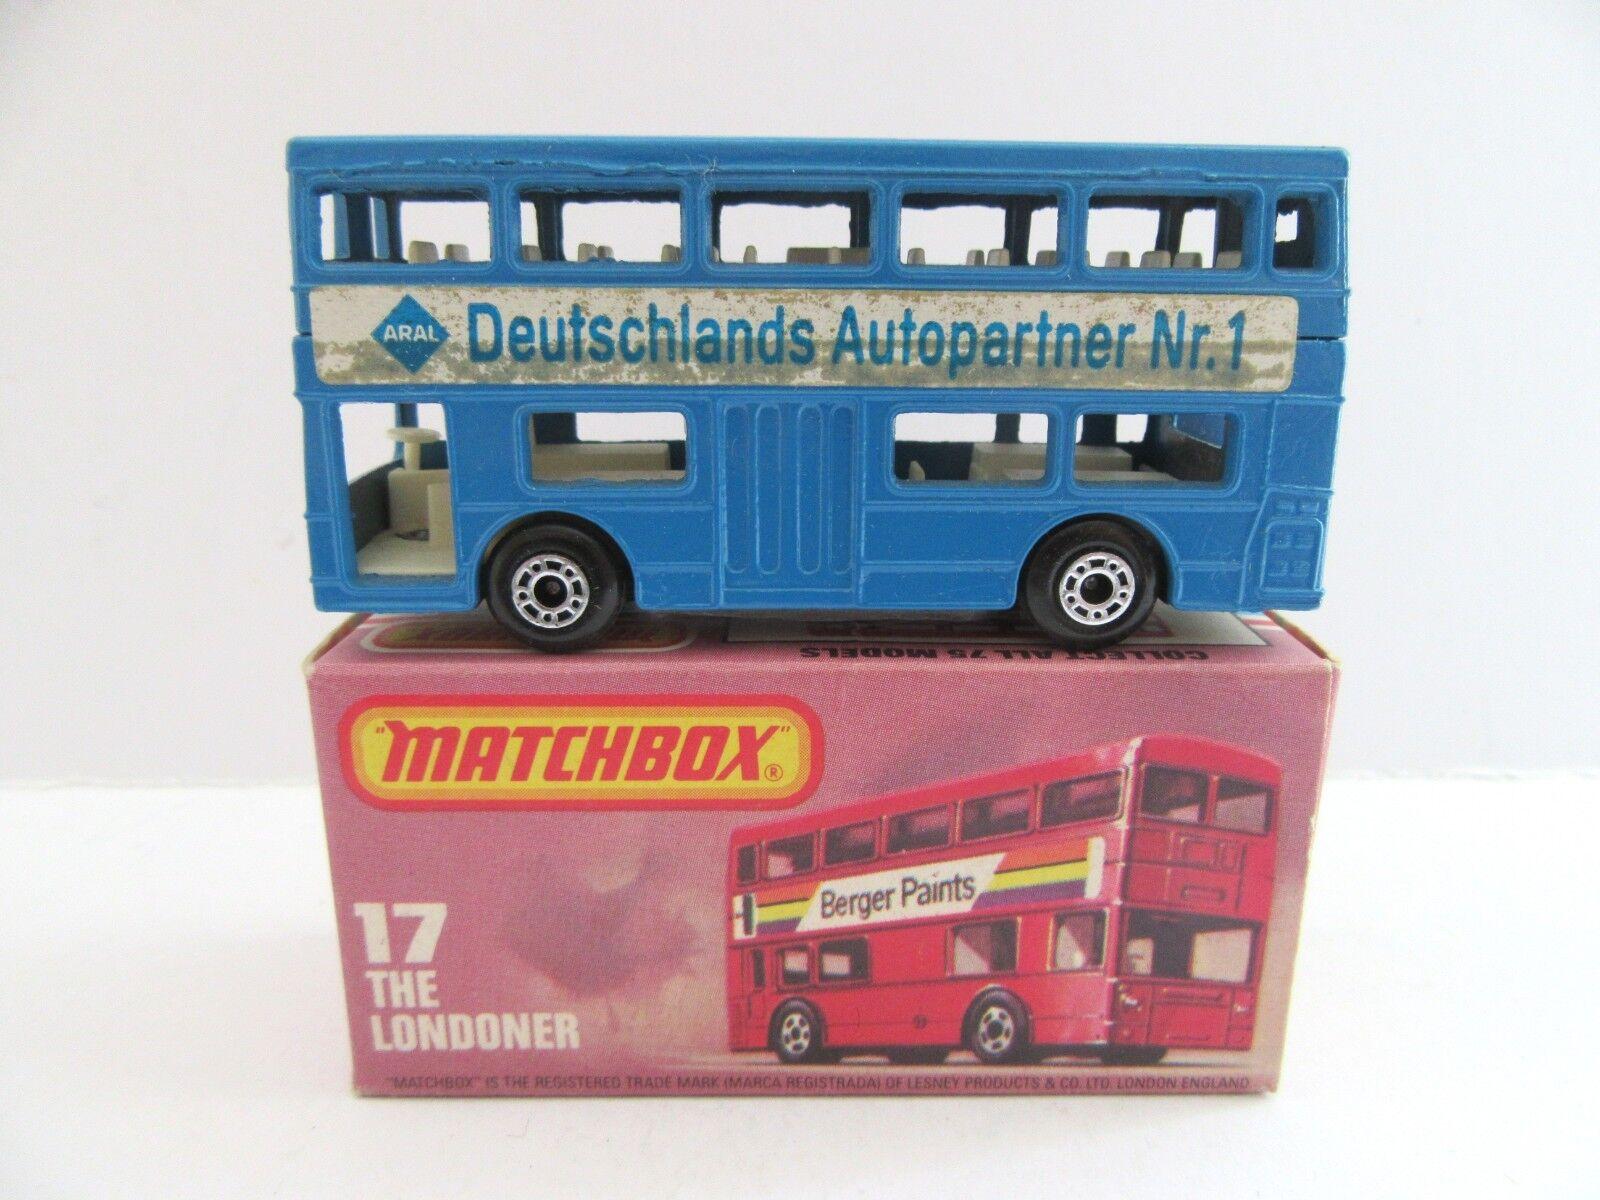 Matchbox Superfast 17b Londoner Bus - Deutschlands Autopartner Nr.1 - Mint Boxed